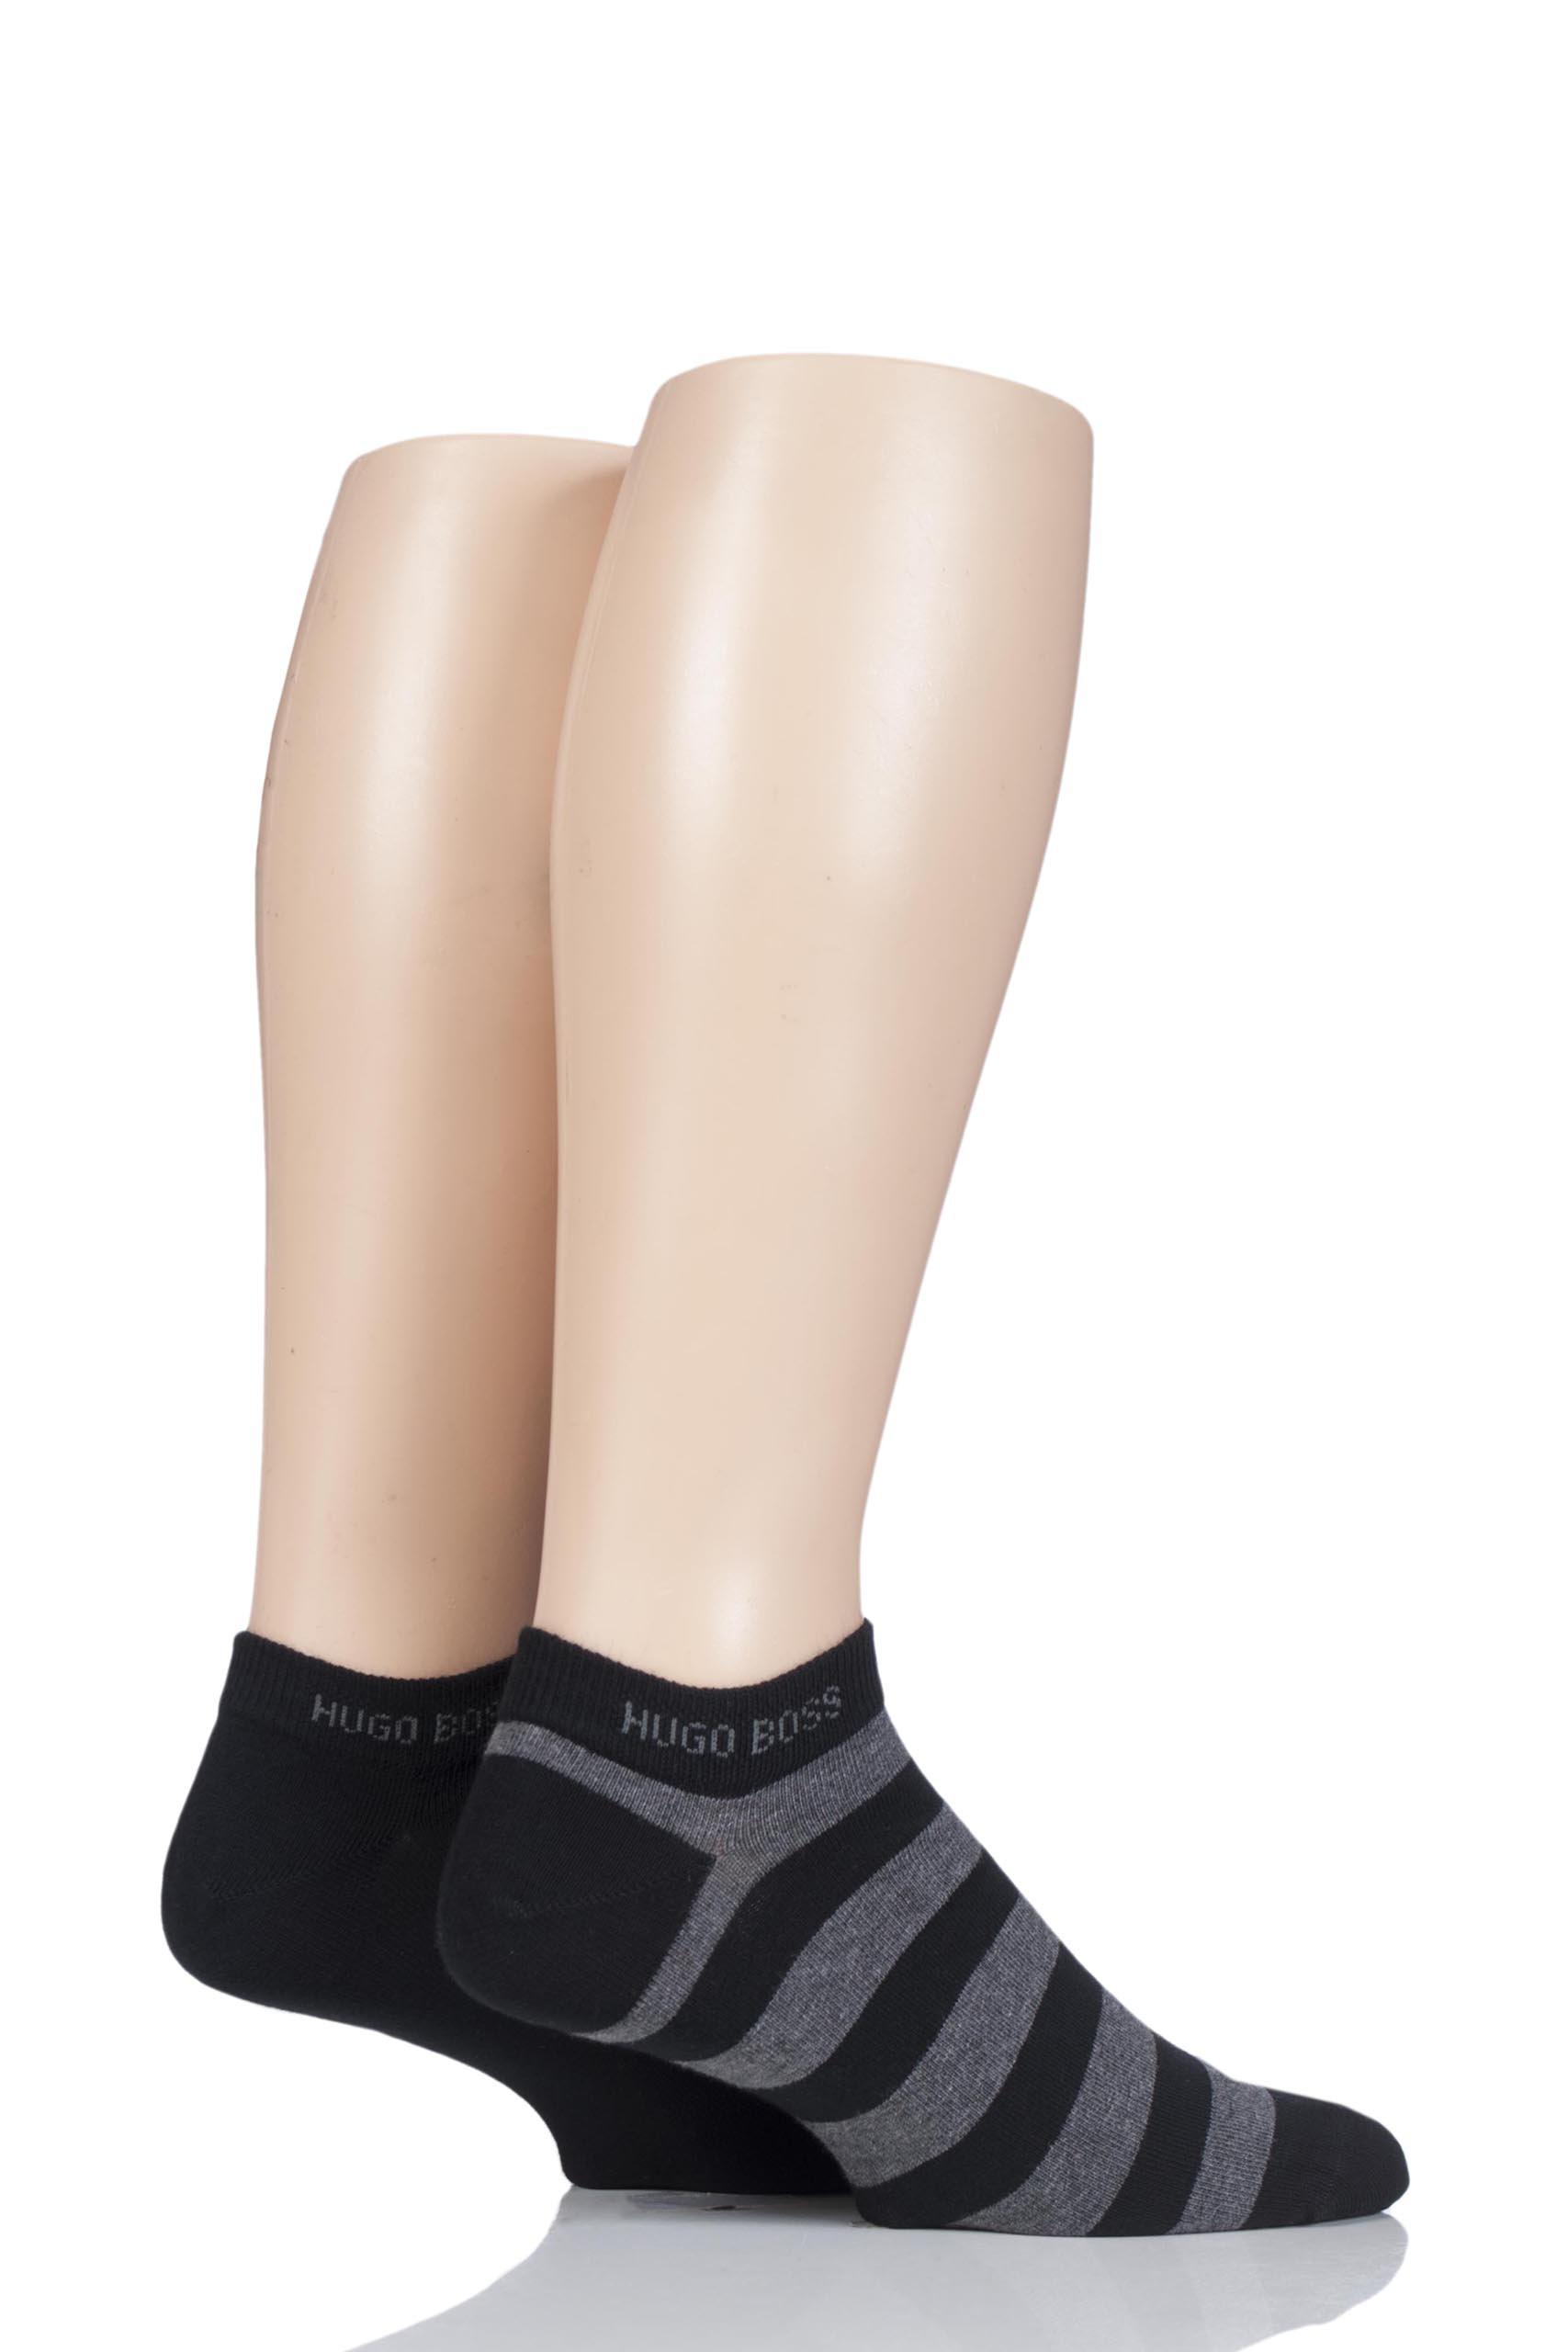 Hugo Boss 50384886 Mens 2 Pair Combed Cotton Plain and Striped Sneaker Socks Black 9-11.5